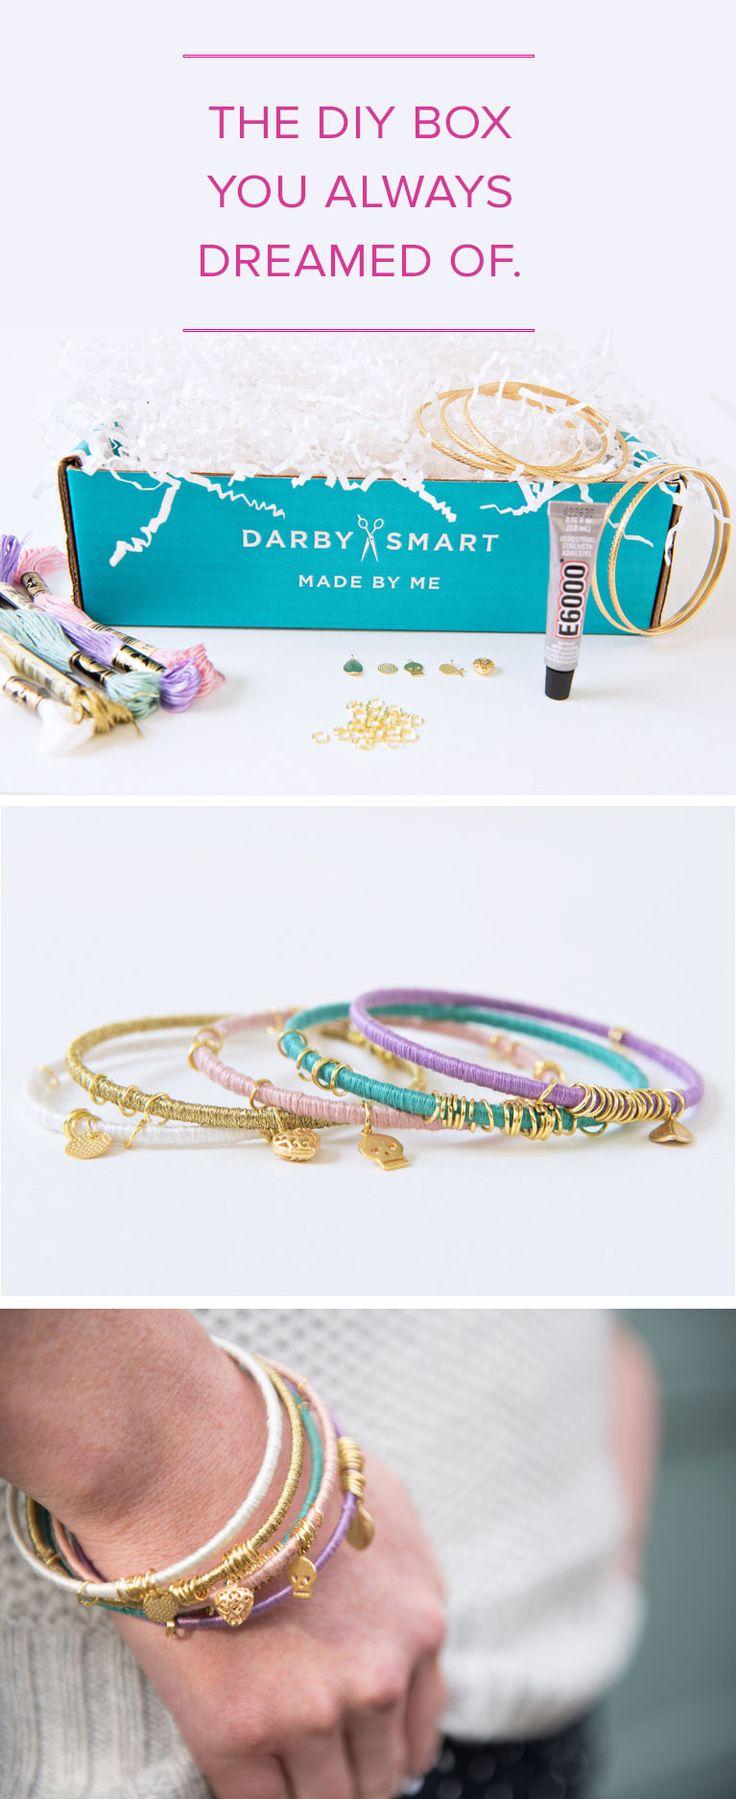 Bi-Monthly Mystery DIY Craft Kit for Girls